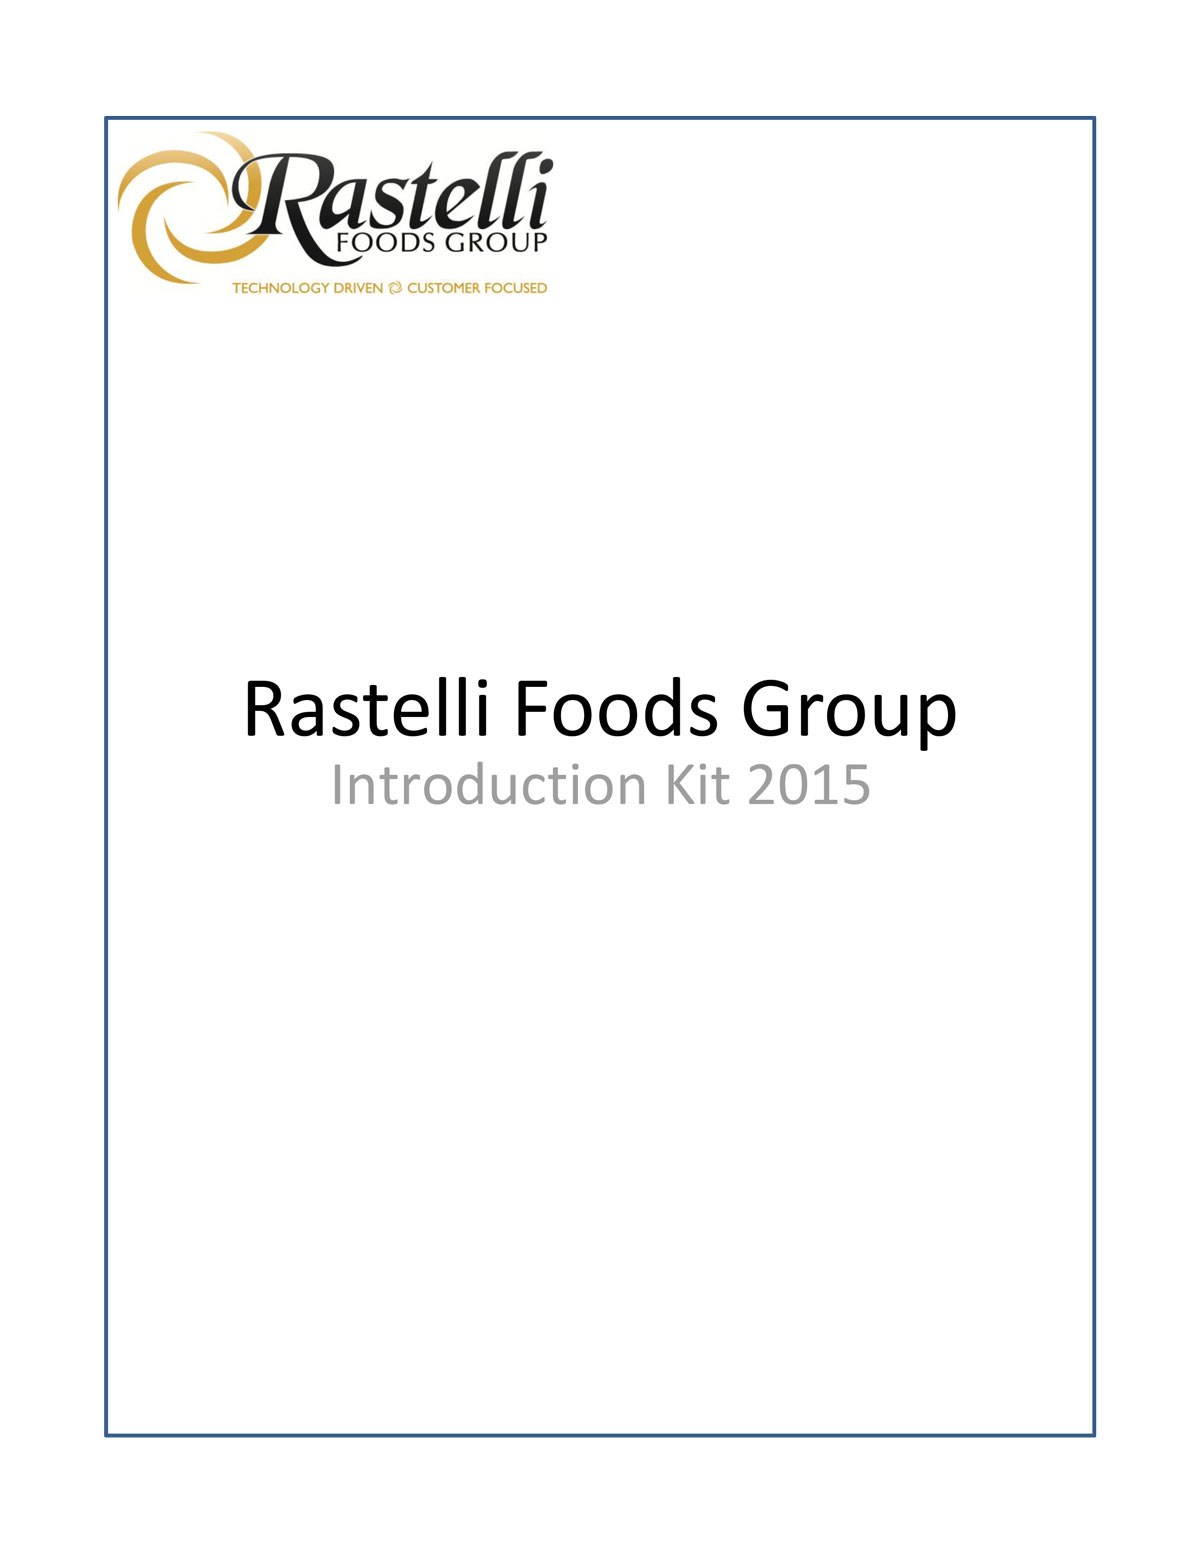 Rastelli Foods Group Introduction Kit